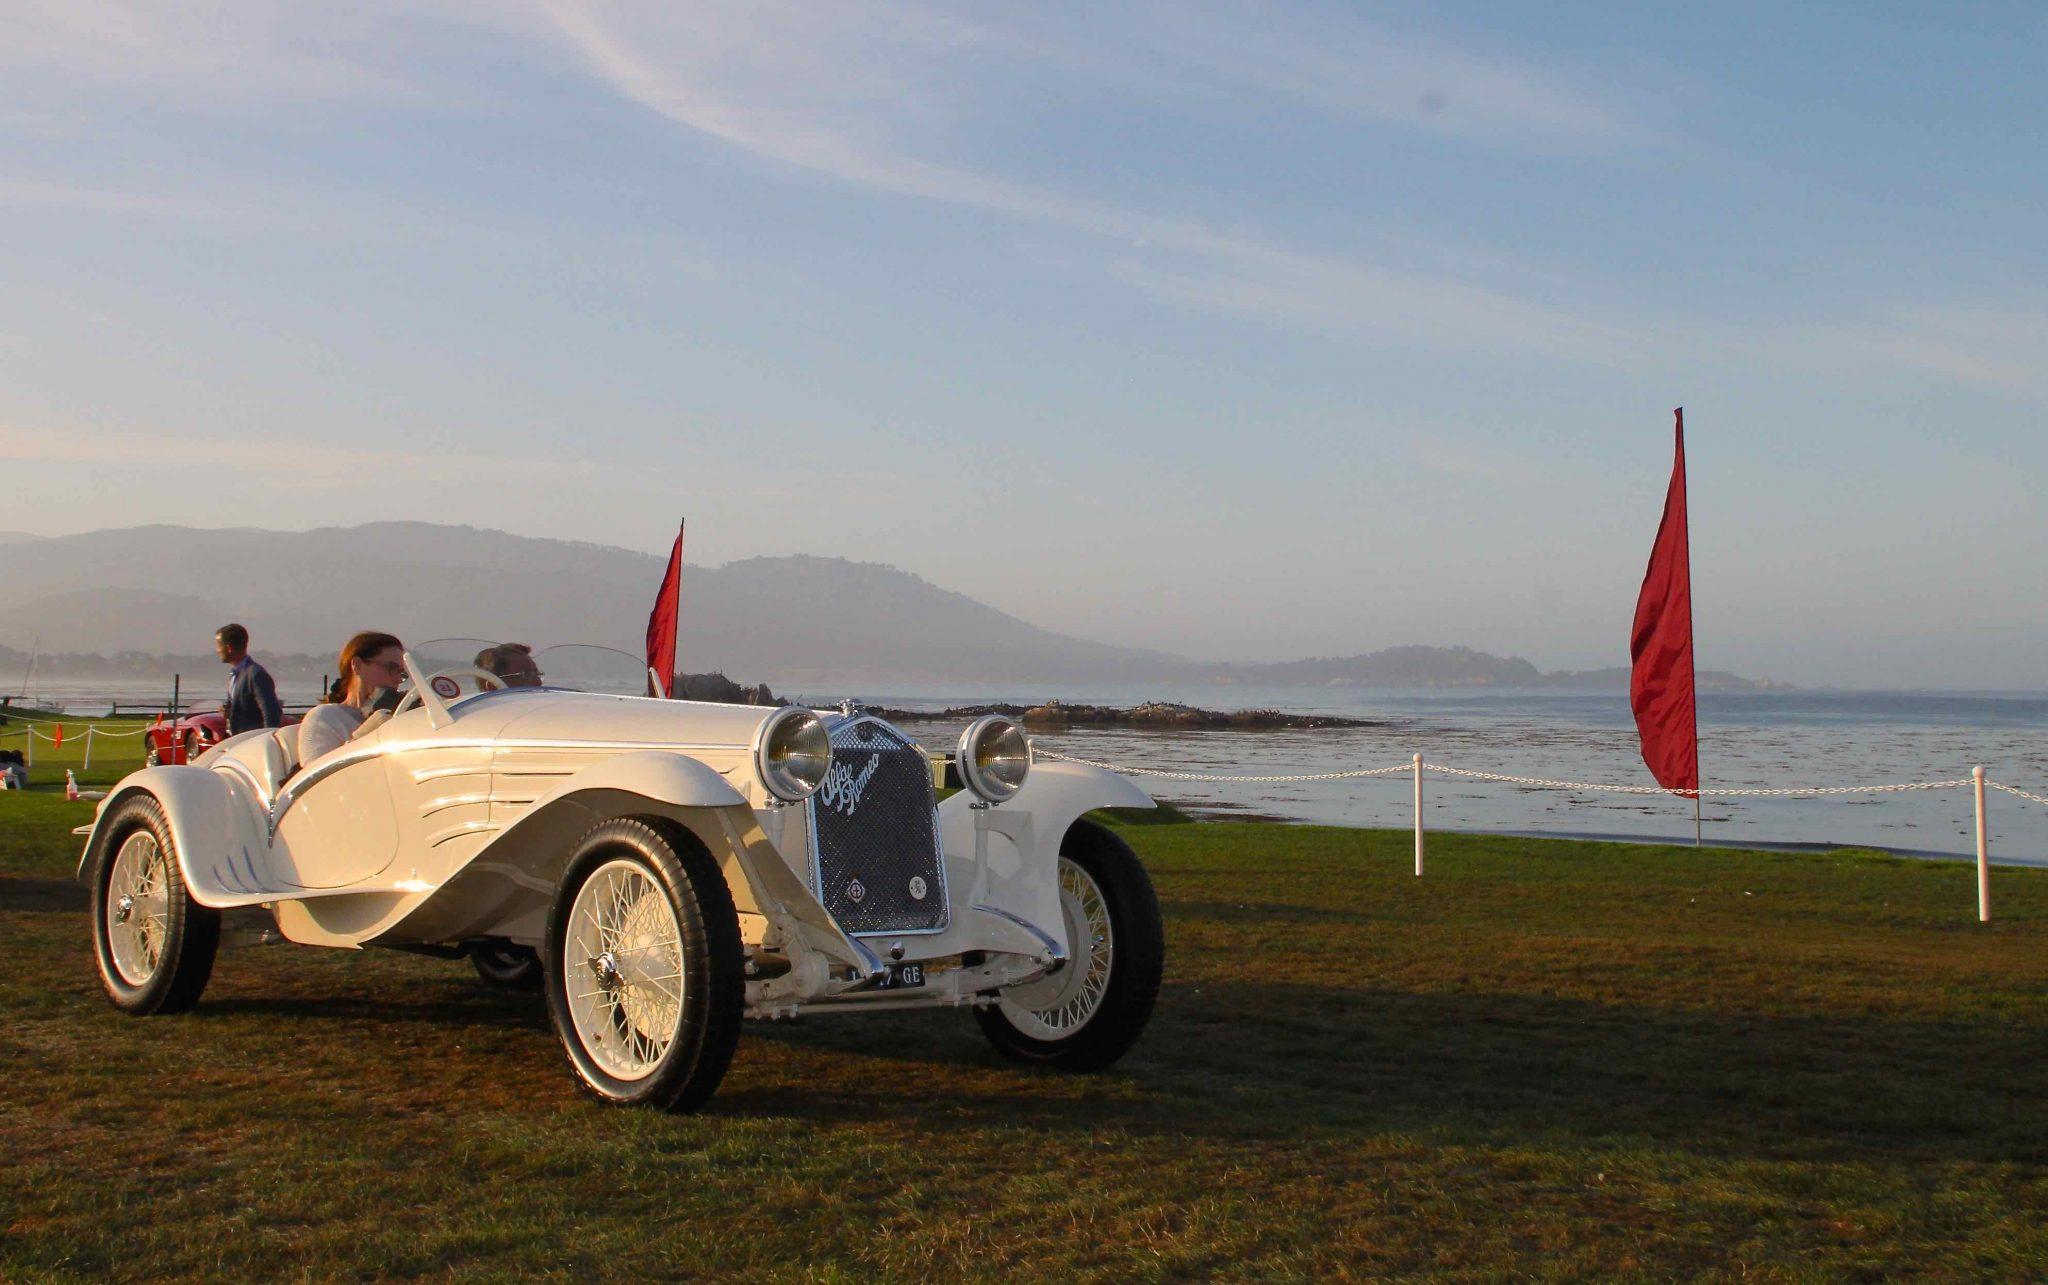 Classic Alfa Romeo show car on the water at Pebble Beach 2015